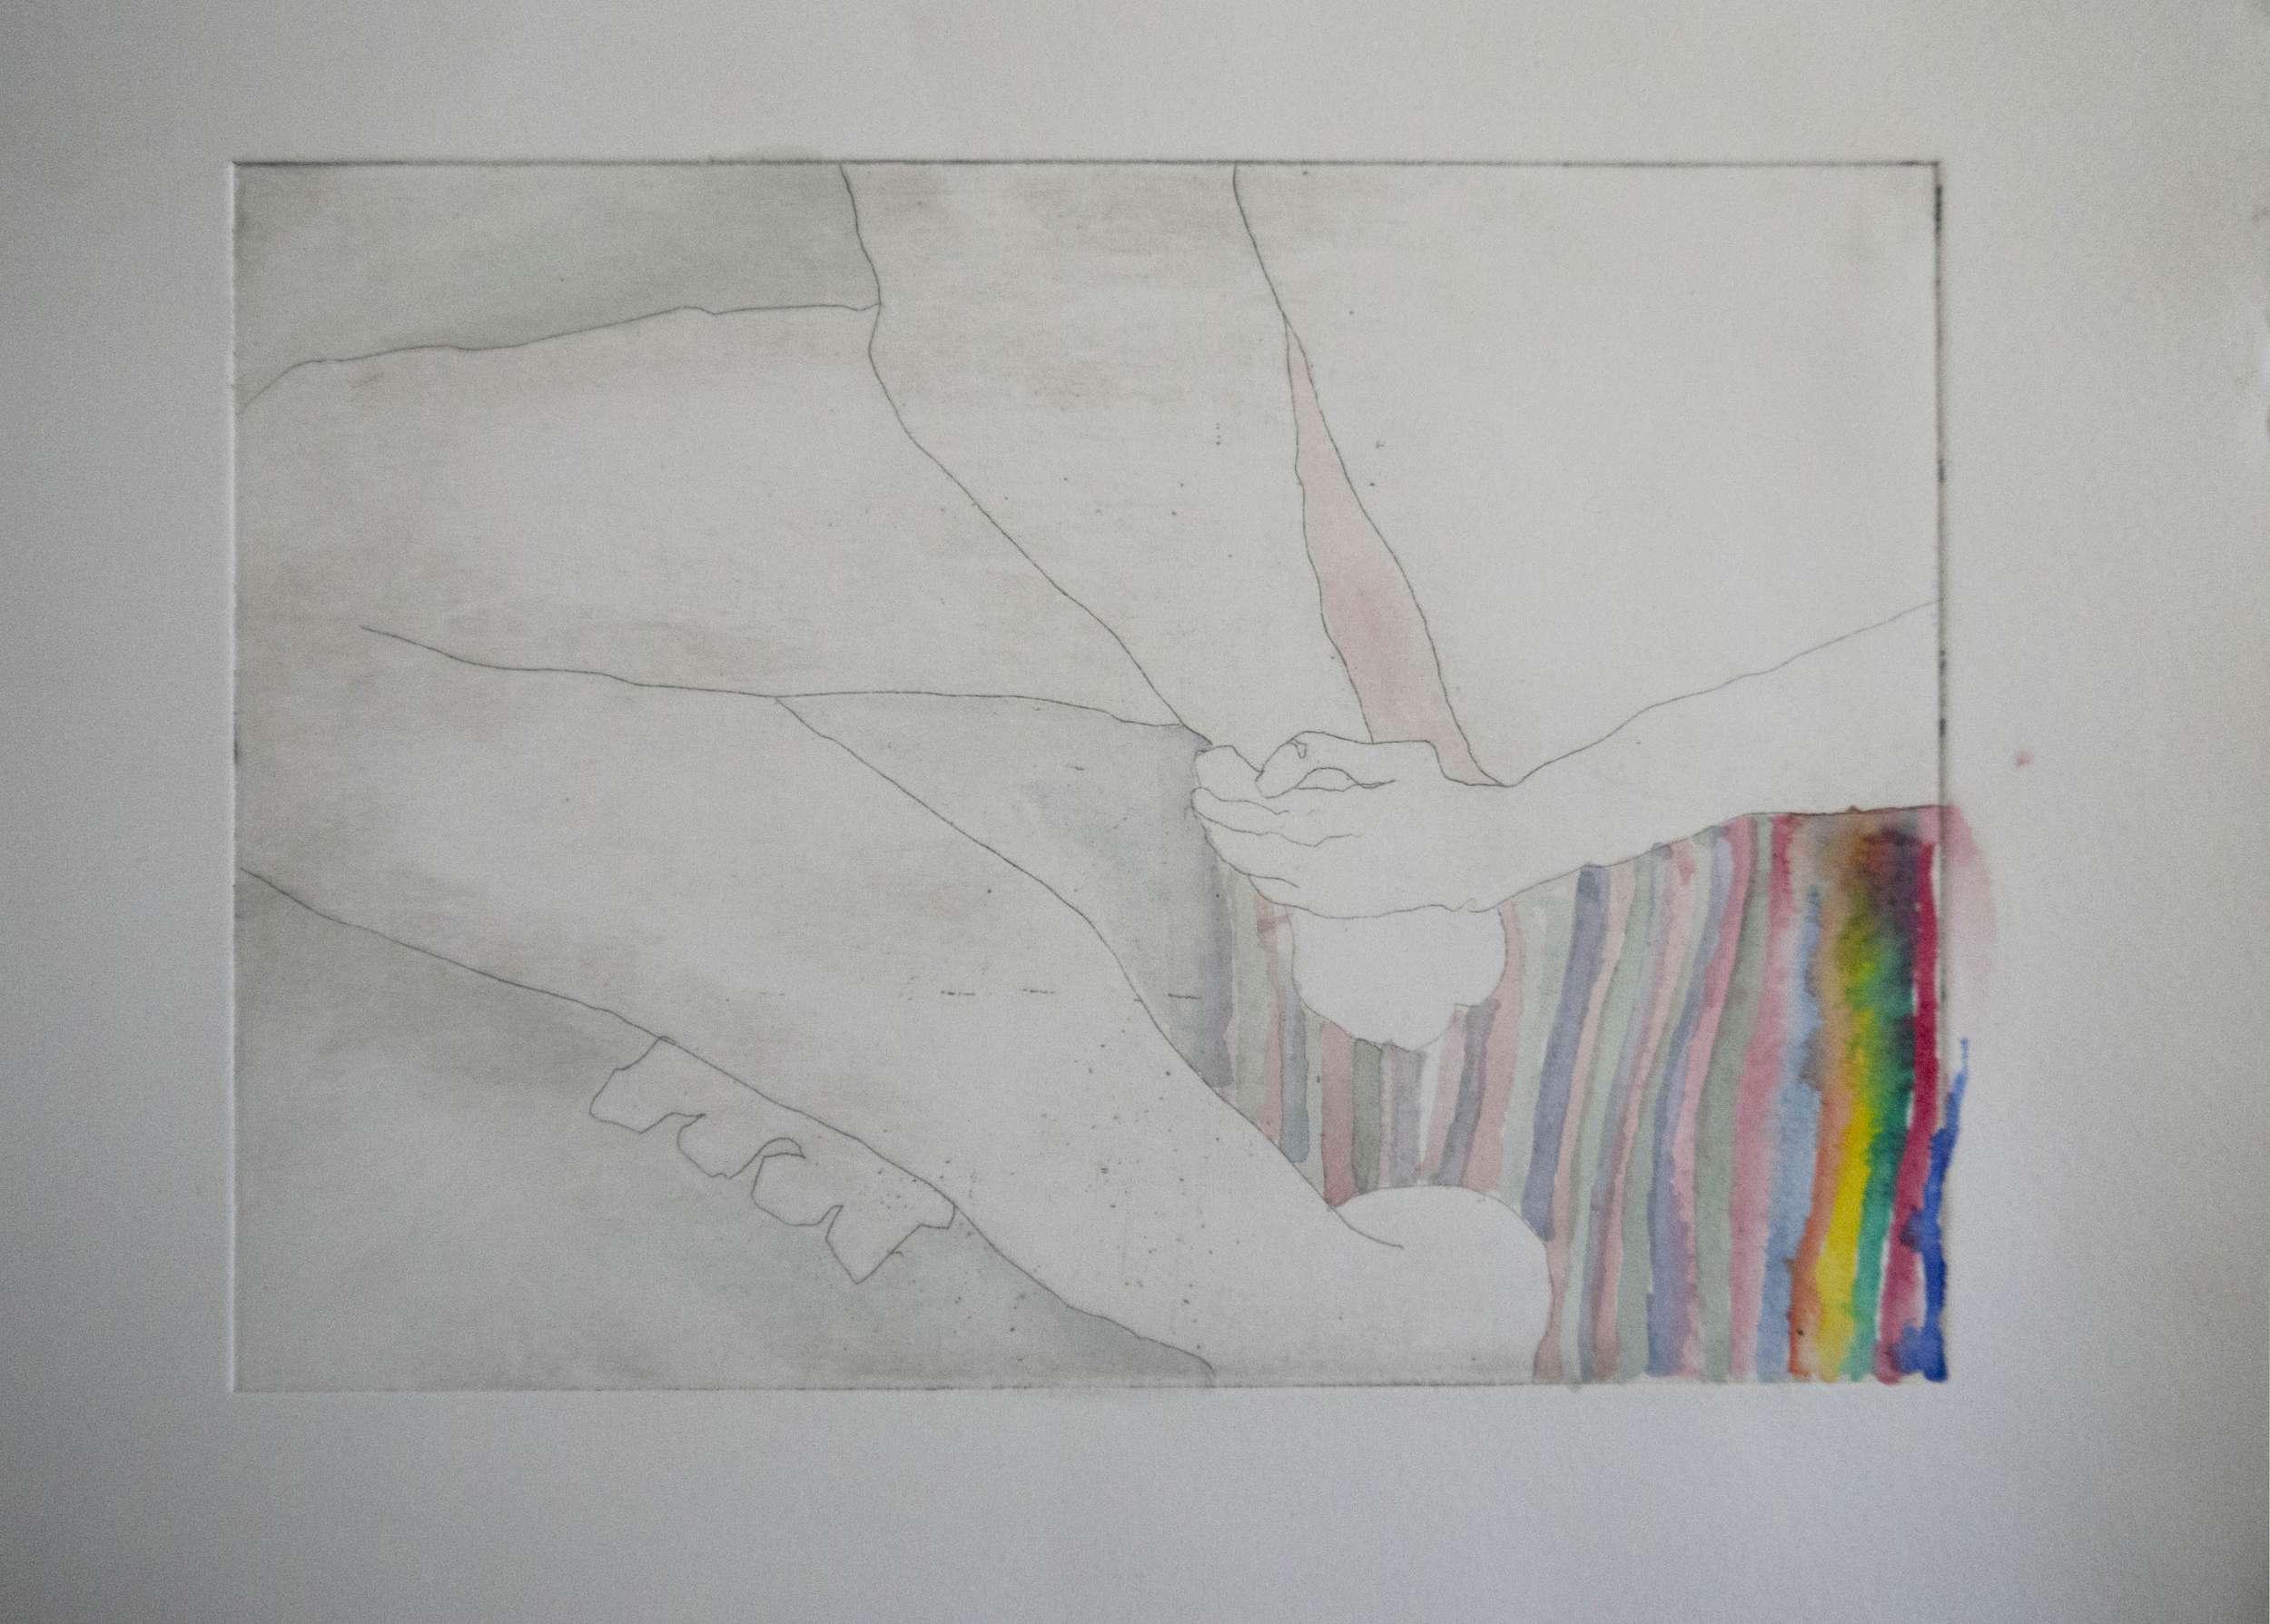 Code 142 LegEtching_rainbow Image